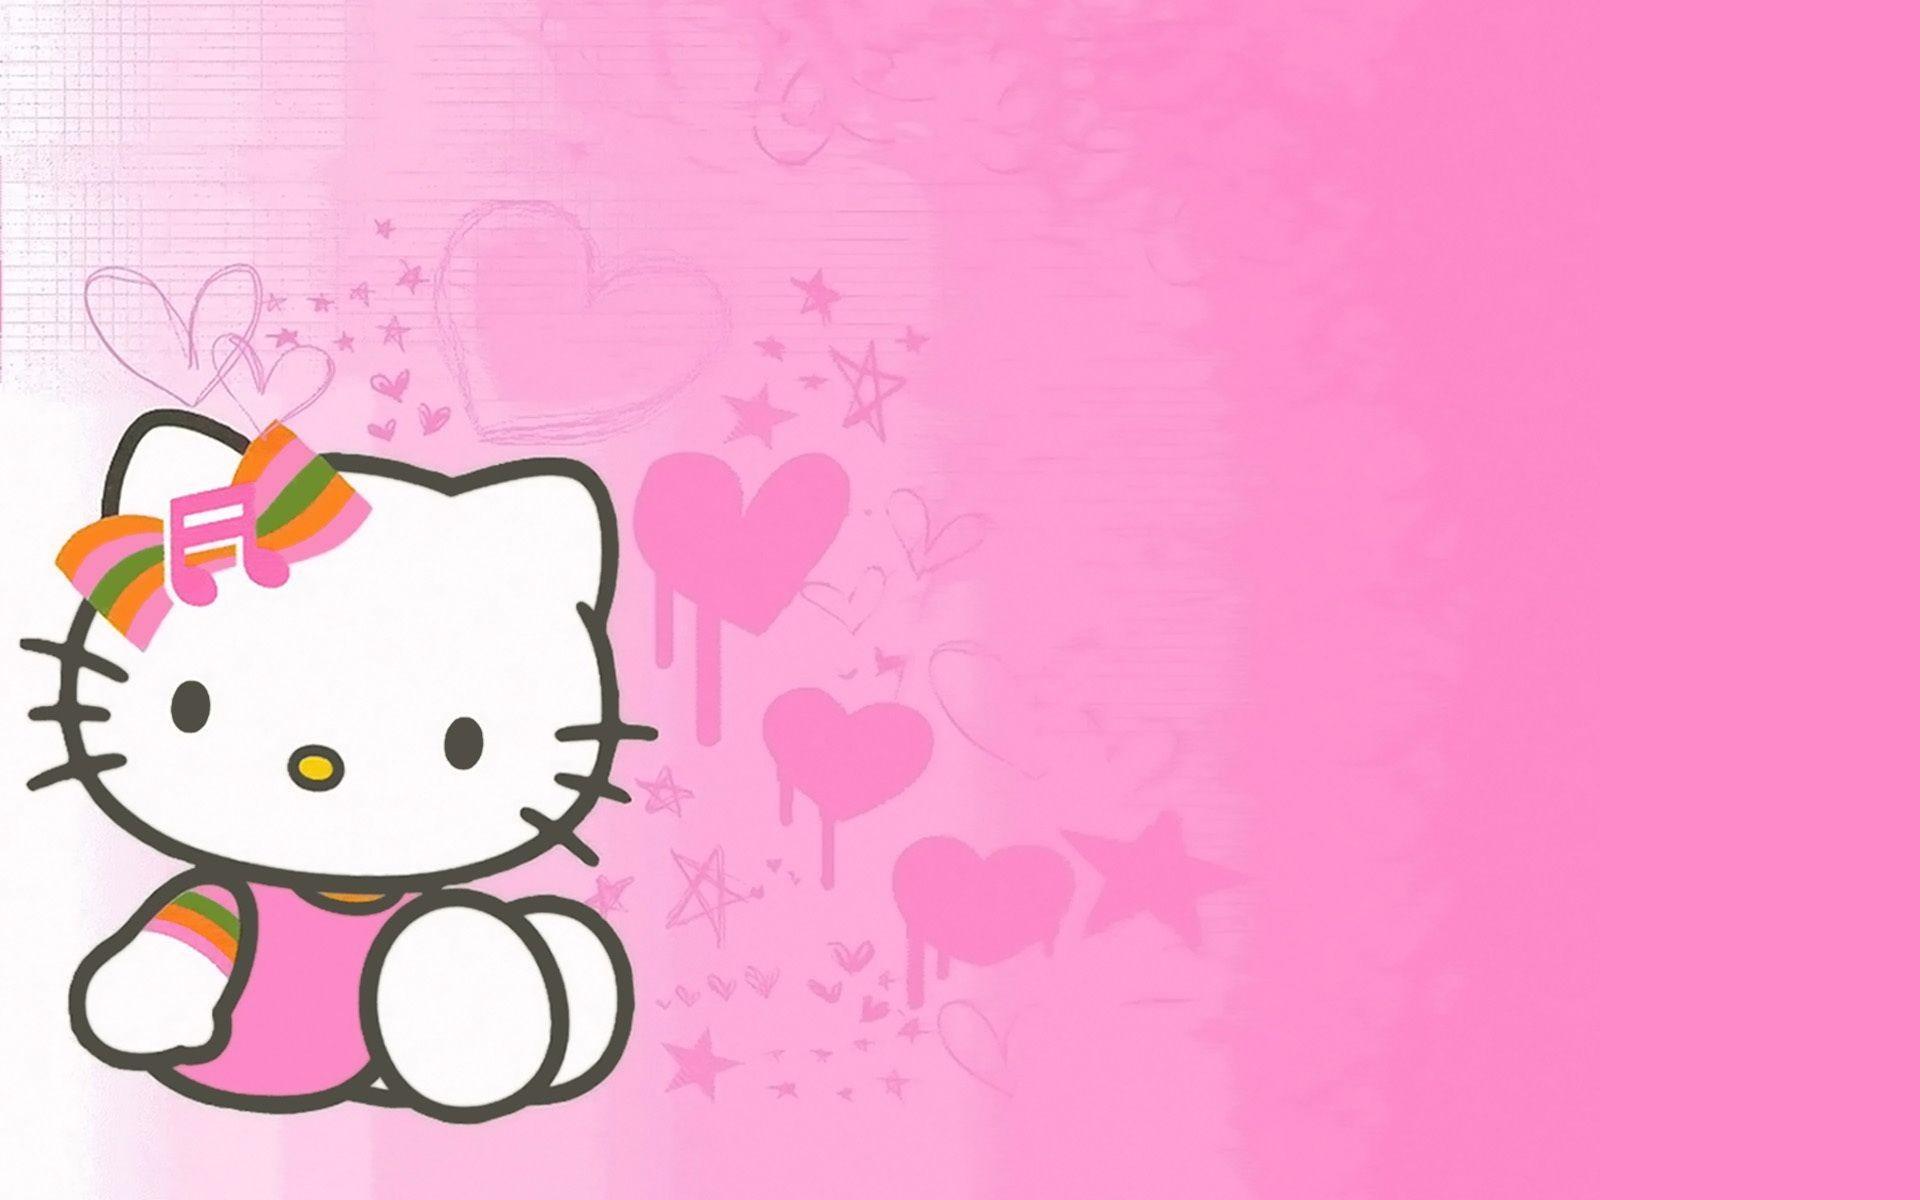 Most Inspiring Wallpaper Hello Kitty Glitter - 781313-large-glitter-hello-kitty-backgrounds-for-computers-1920x1200  Snapshot_624191.jpg